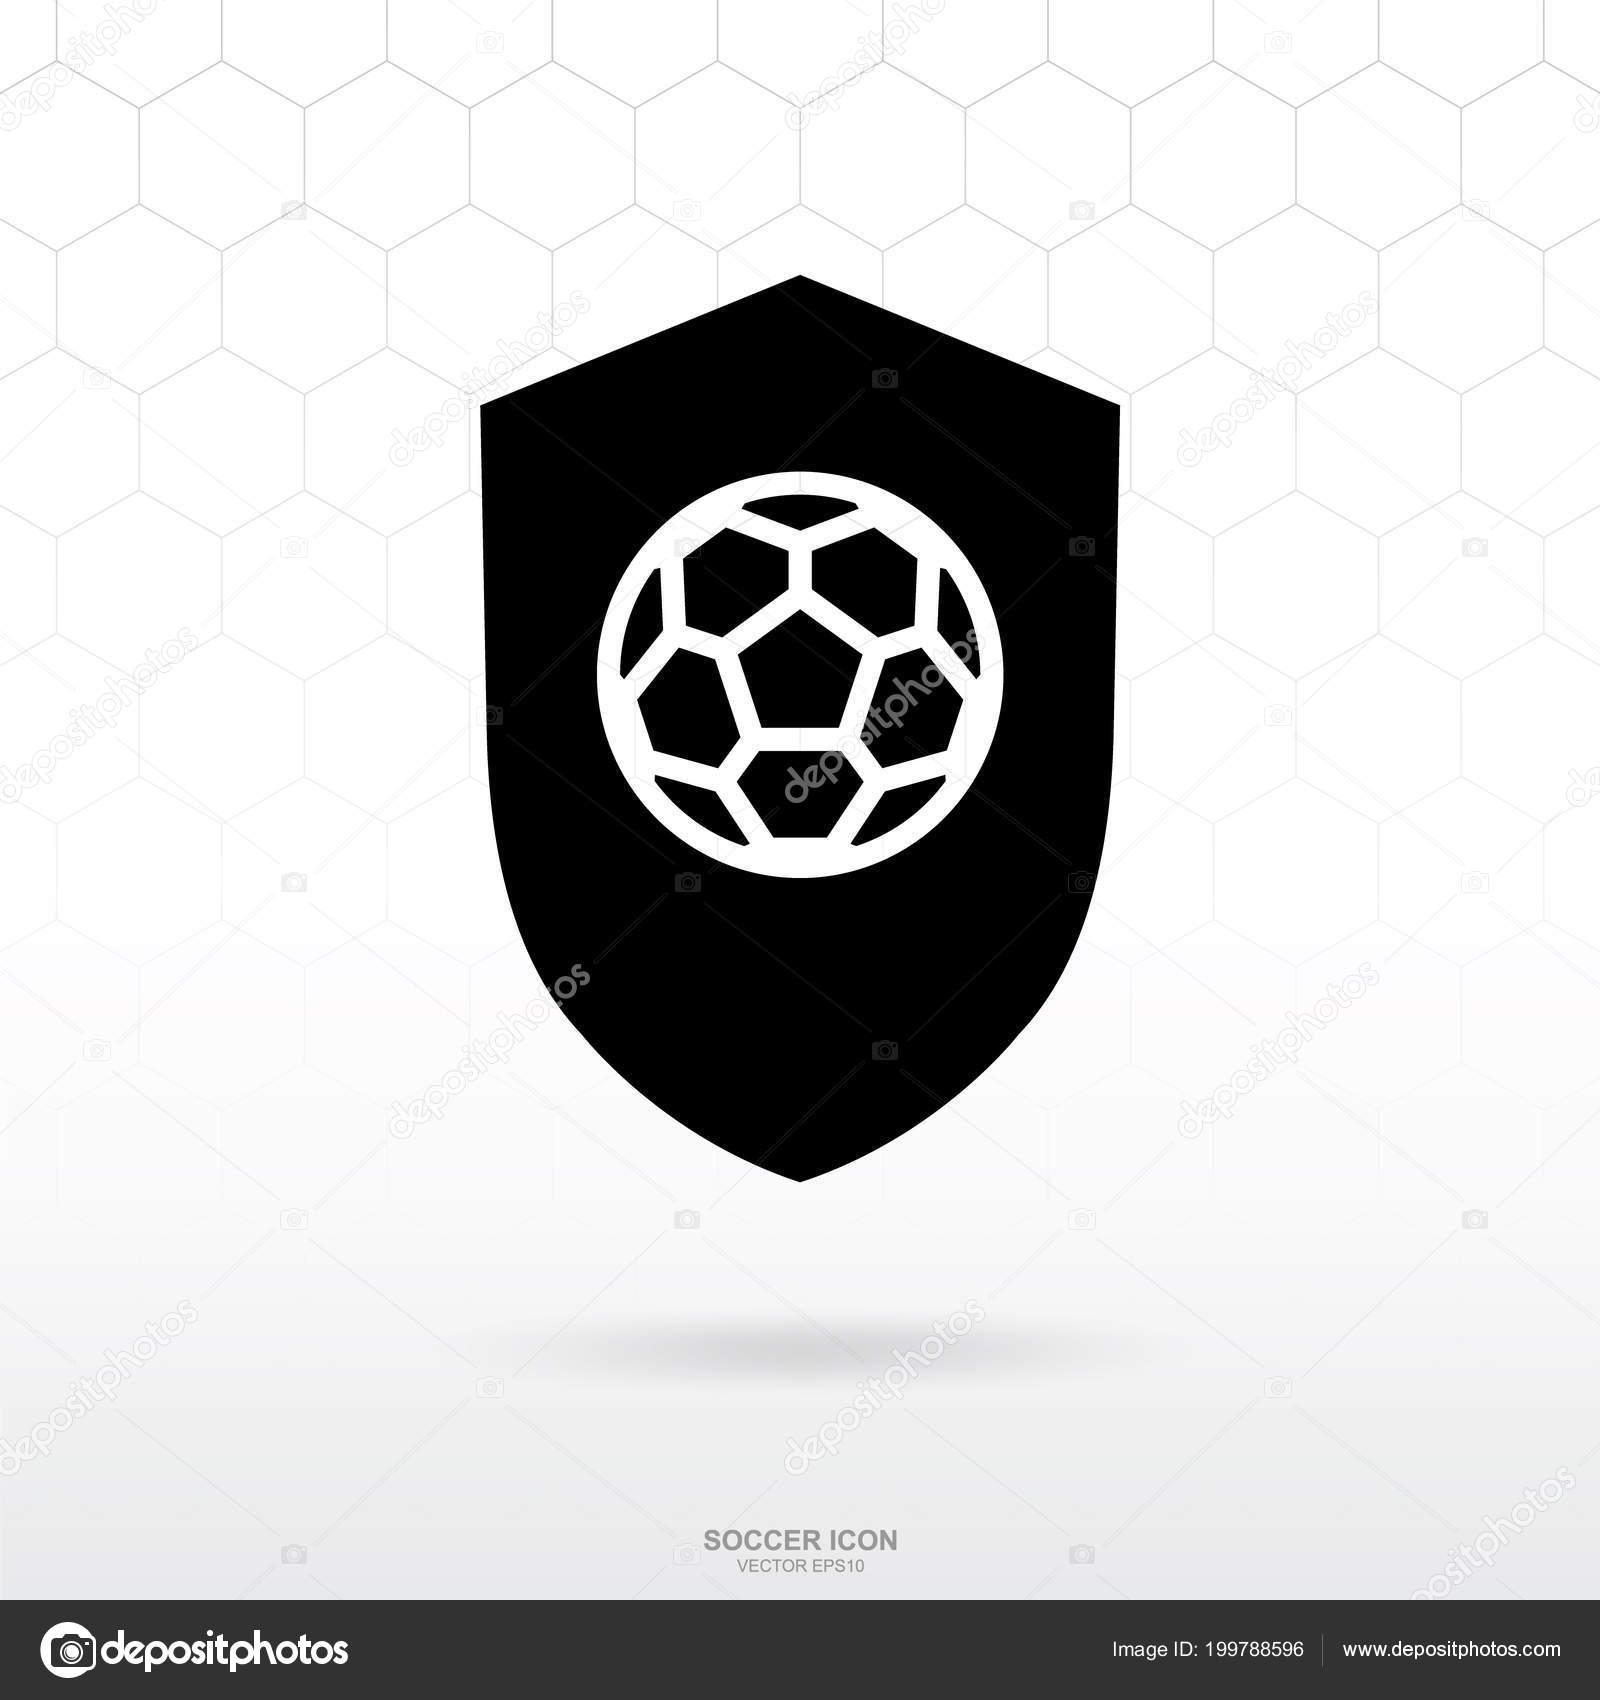 ᐈ logo futsal team stock vectors royalty free futsal logo images download on depositphotos https depositphotos com 199788596 stock illustration soccer logo icon soccer football html